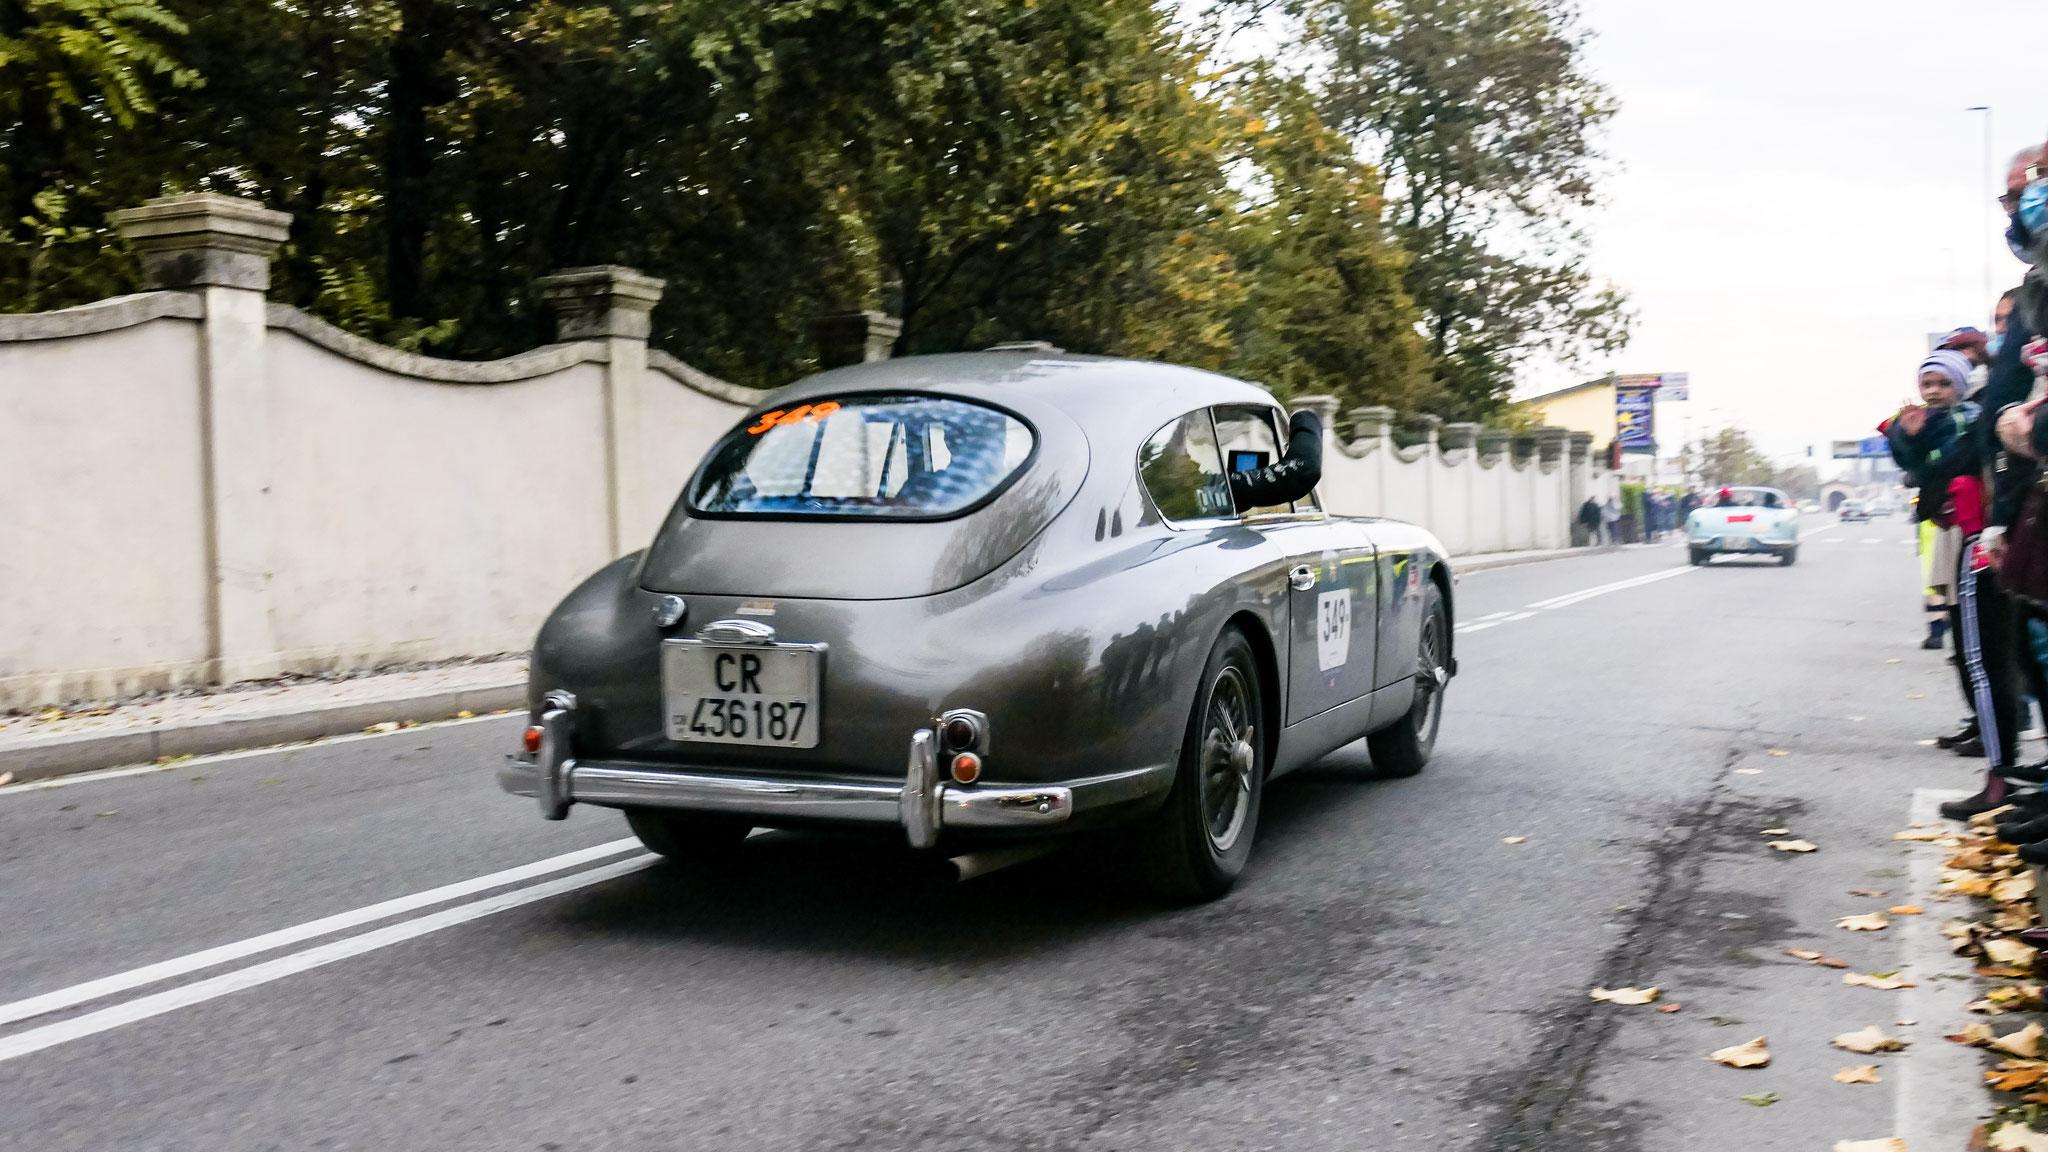 Aston Martin DB2/4 - CR-436187